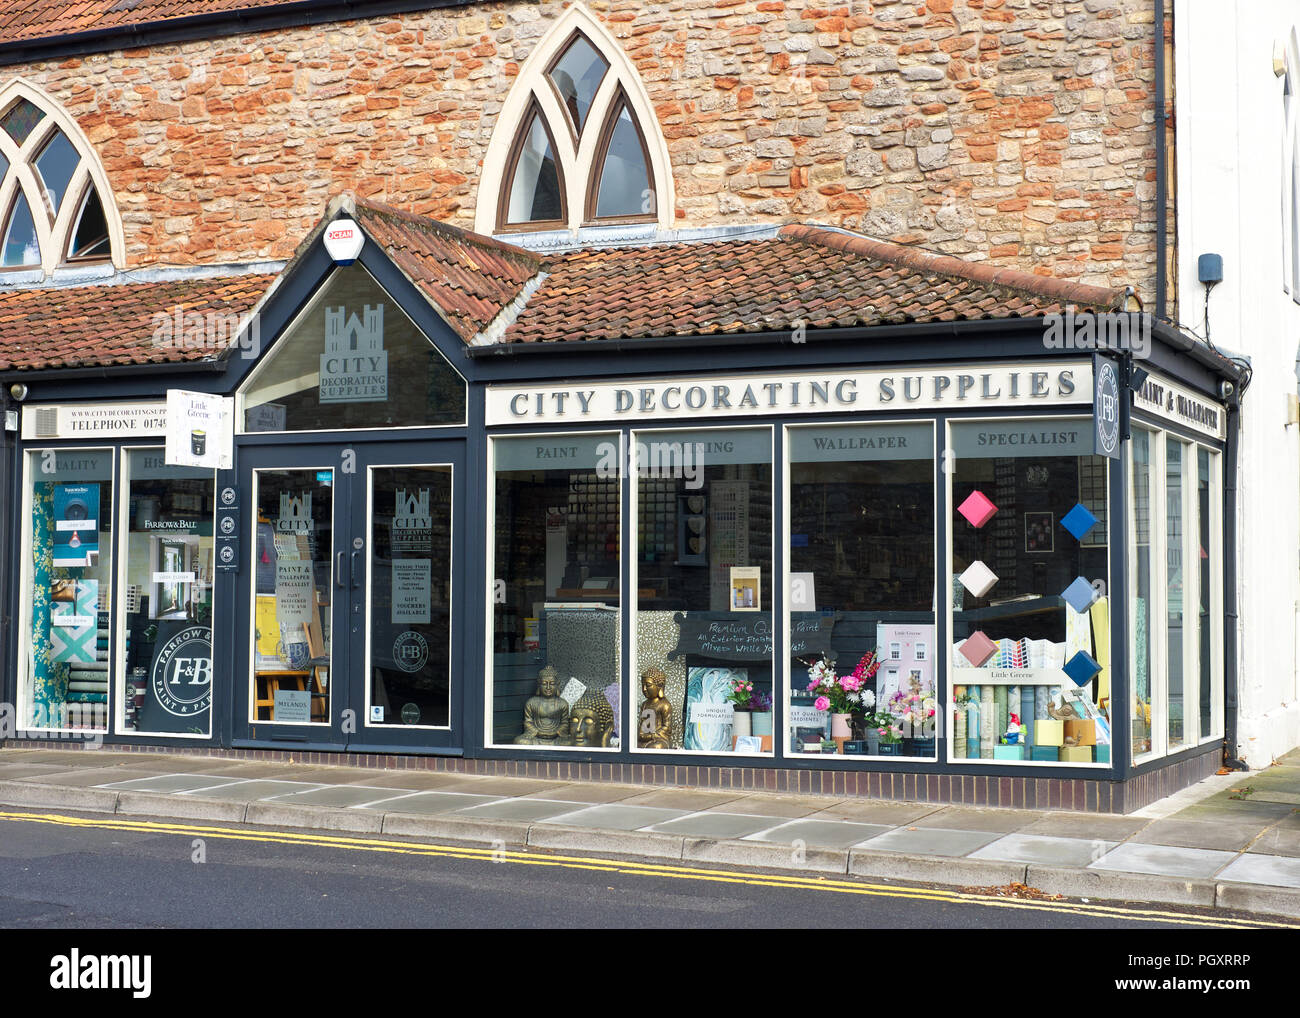 City Decorating Supplies shop front, Wells, Somerset, Uk - Stock Image